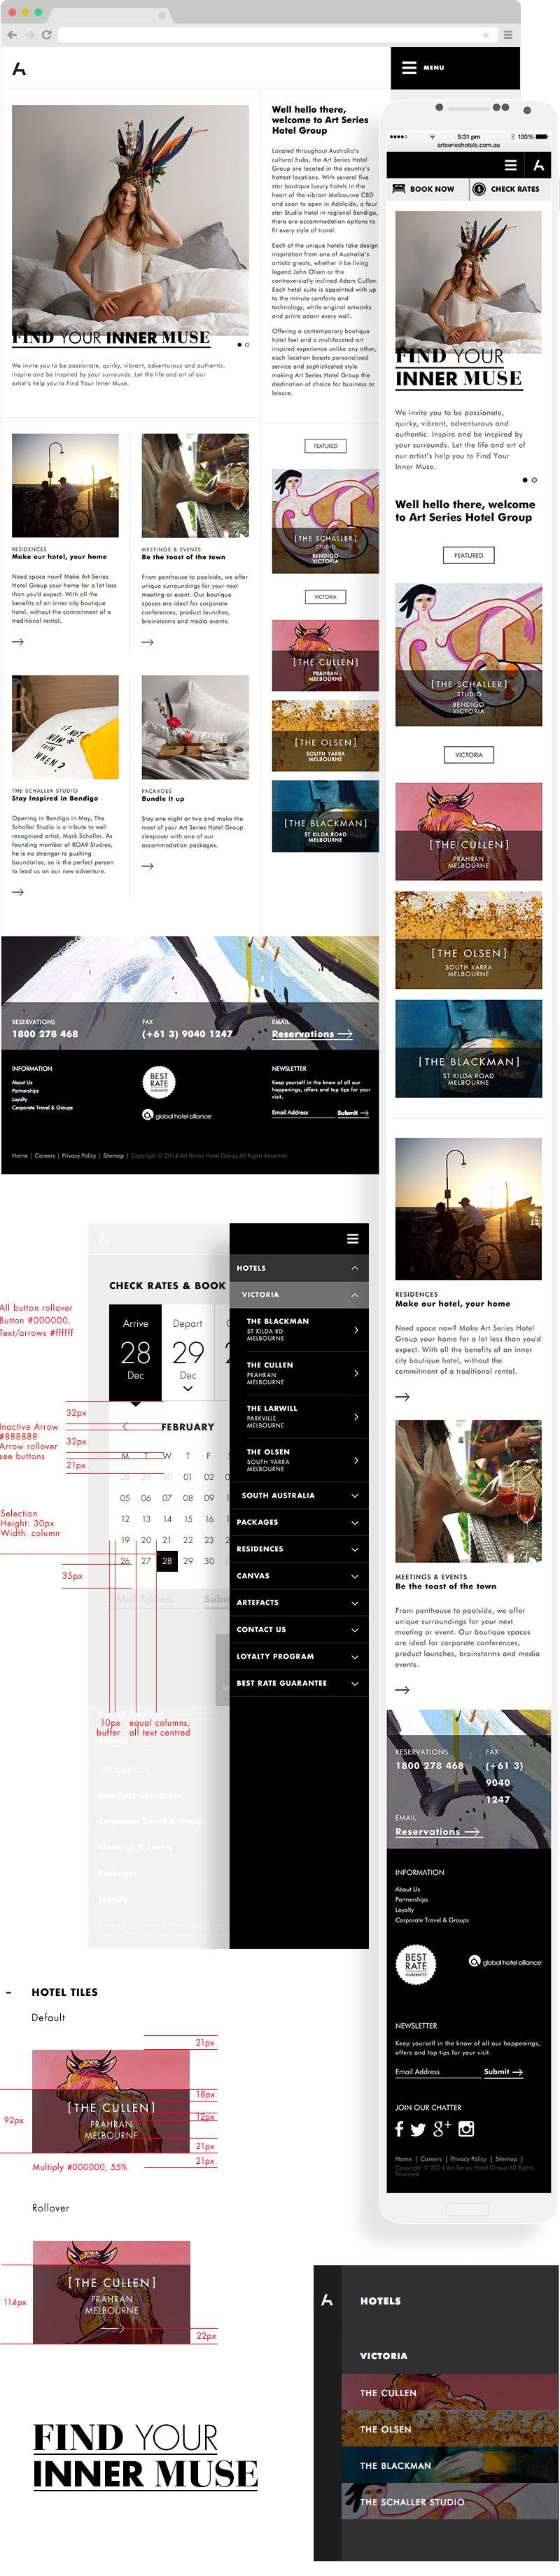 Carter Ux Digital Agency Web Design Melbourne Sydney Perth Web Design Tools Interactive Design Web App Design